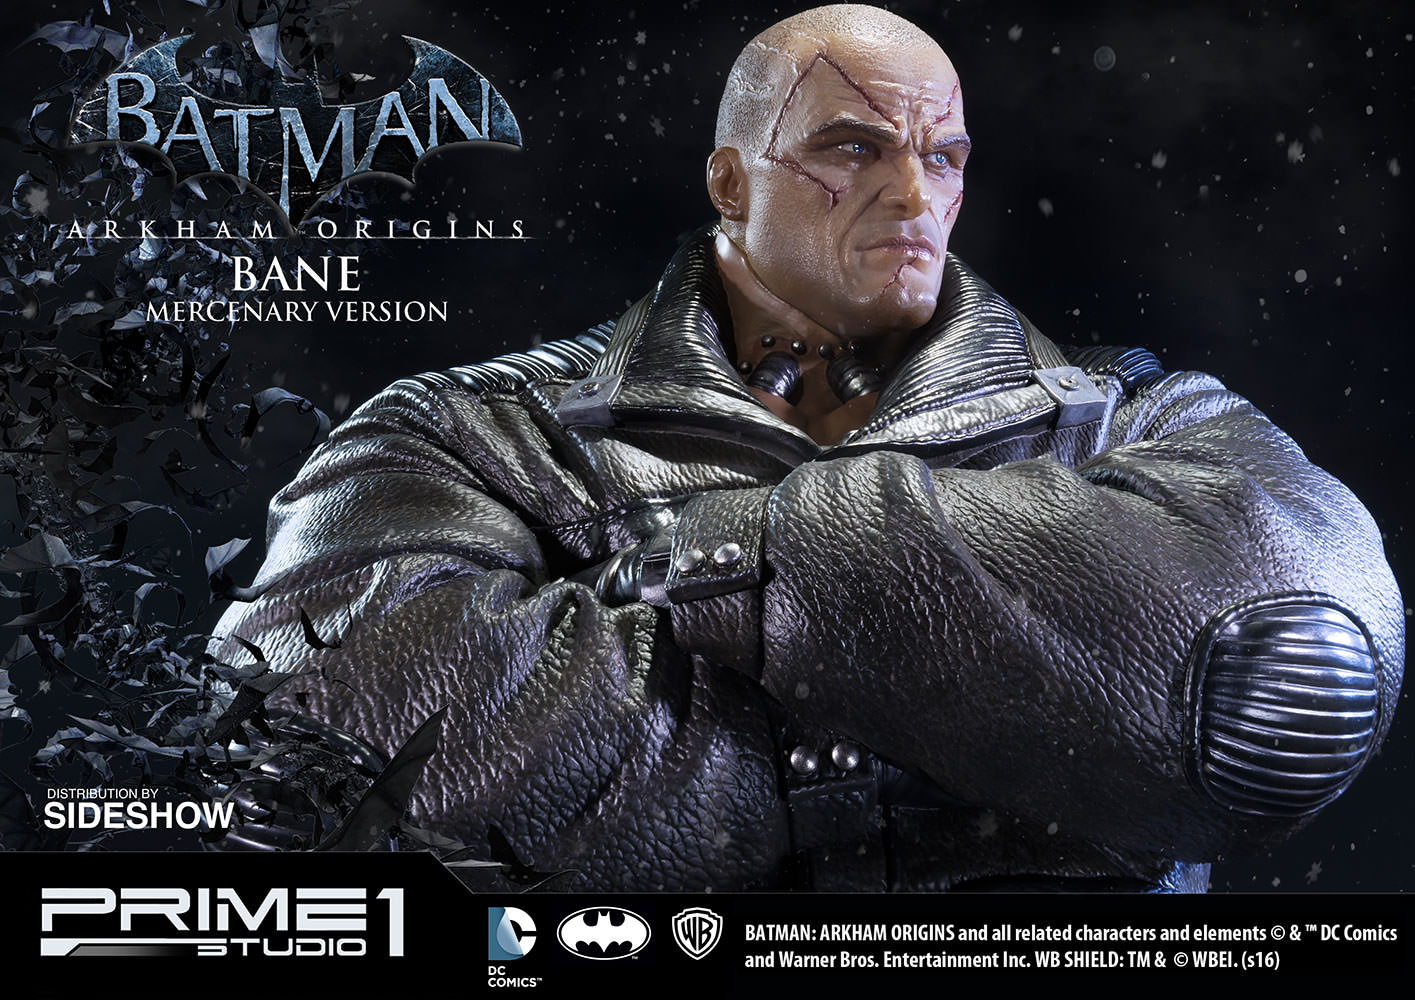 bane mercenary version statue